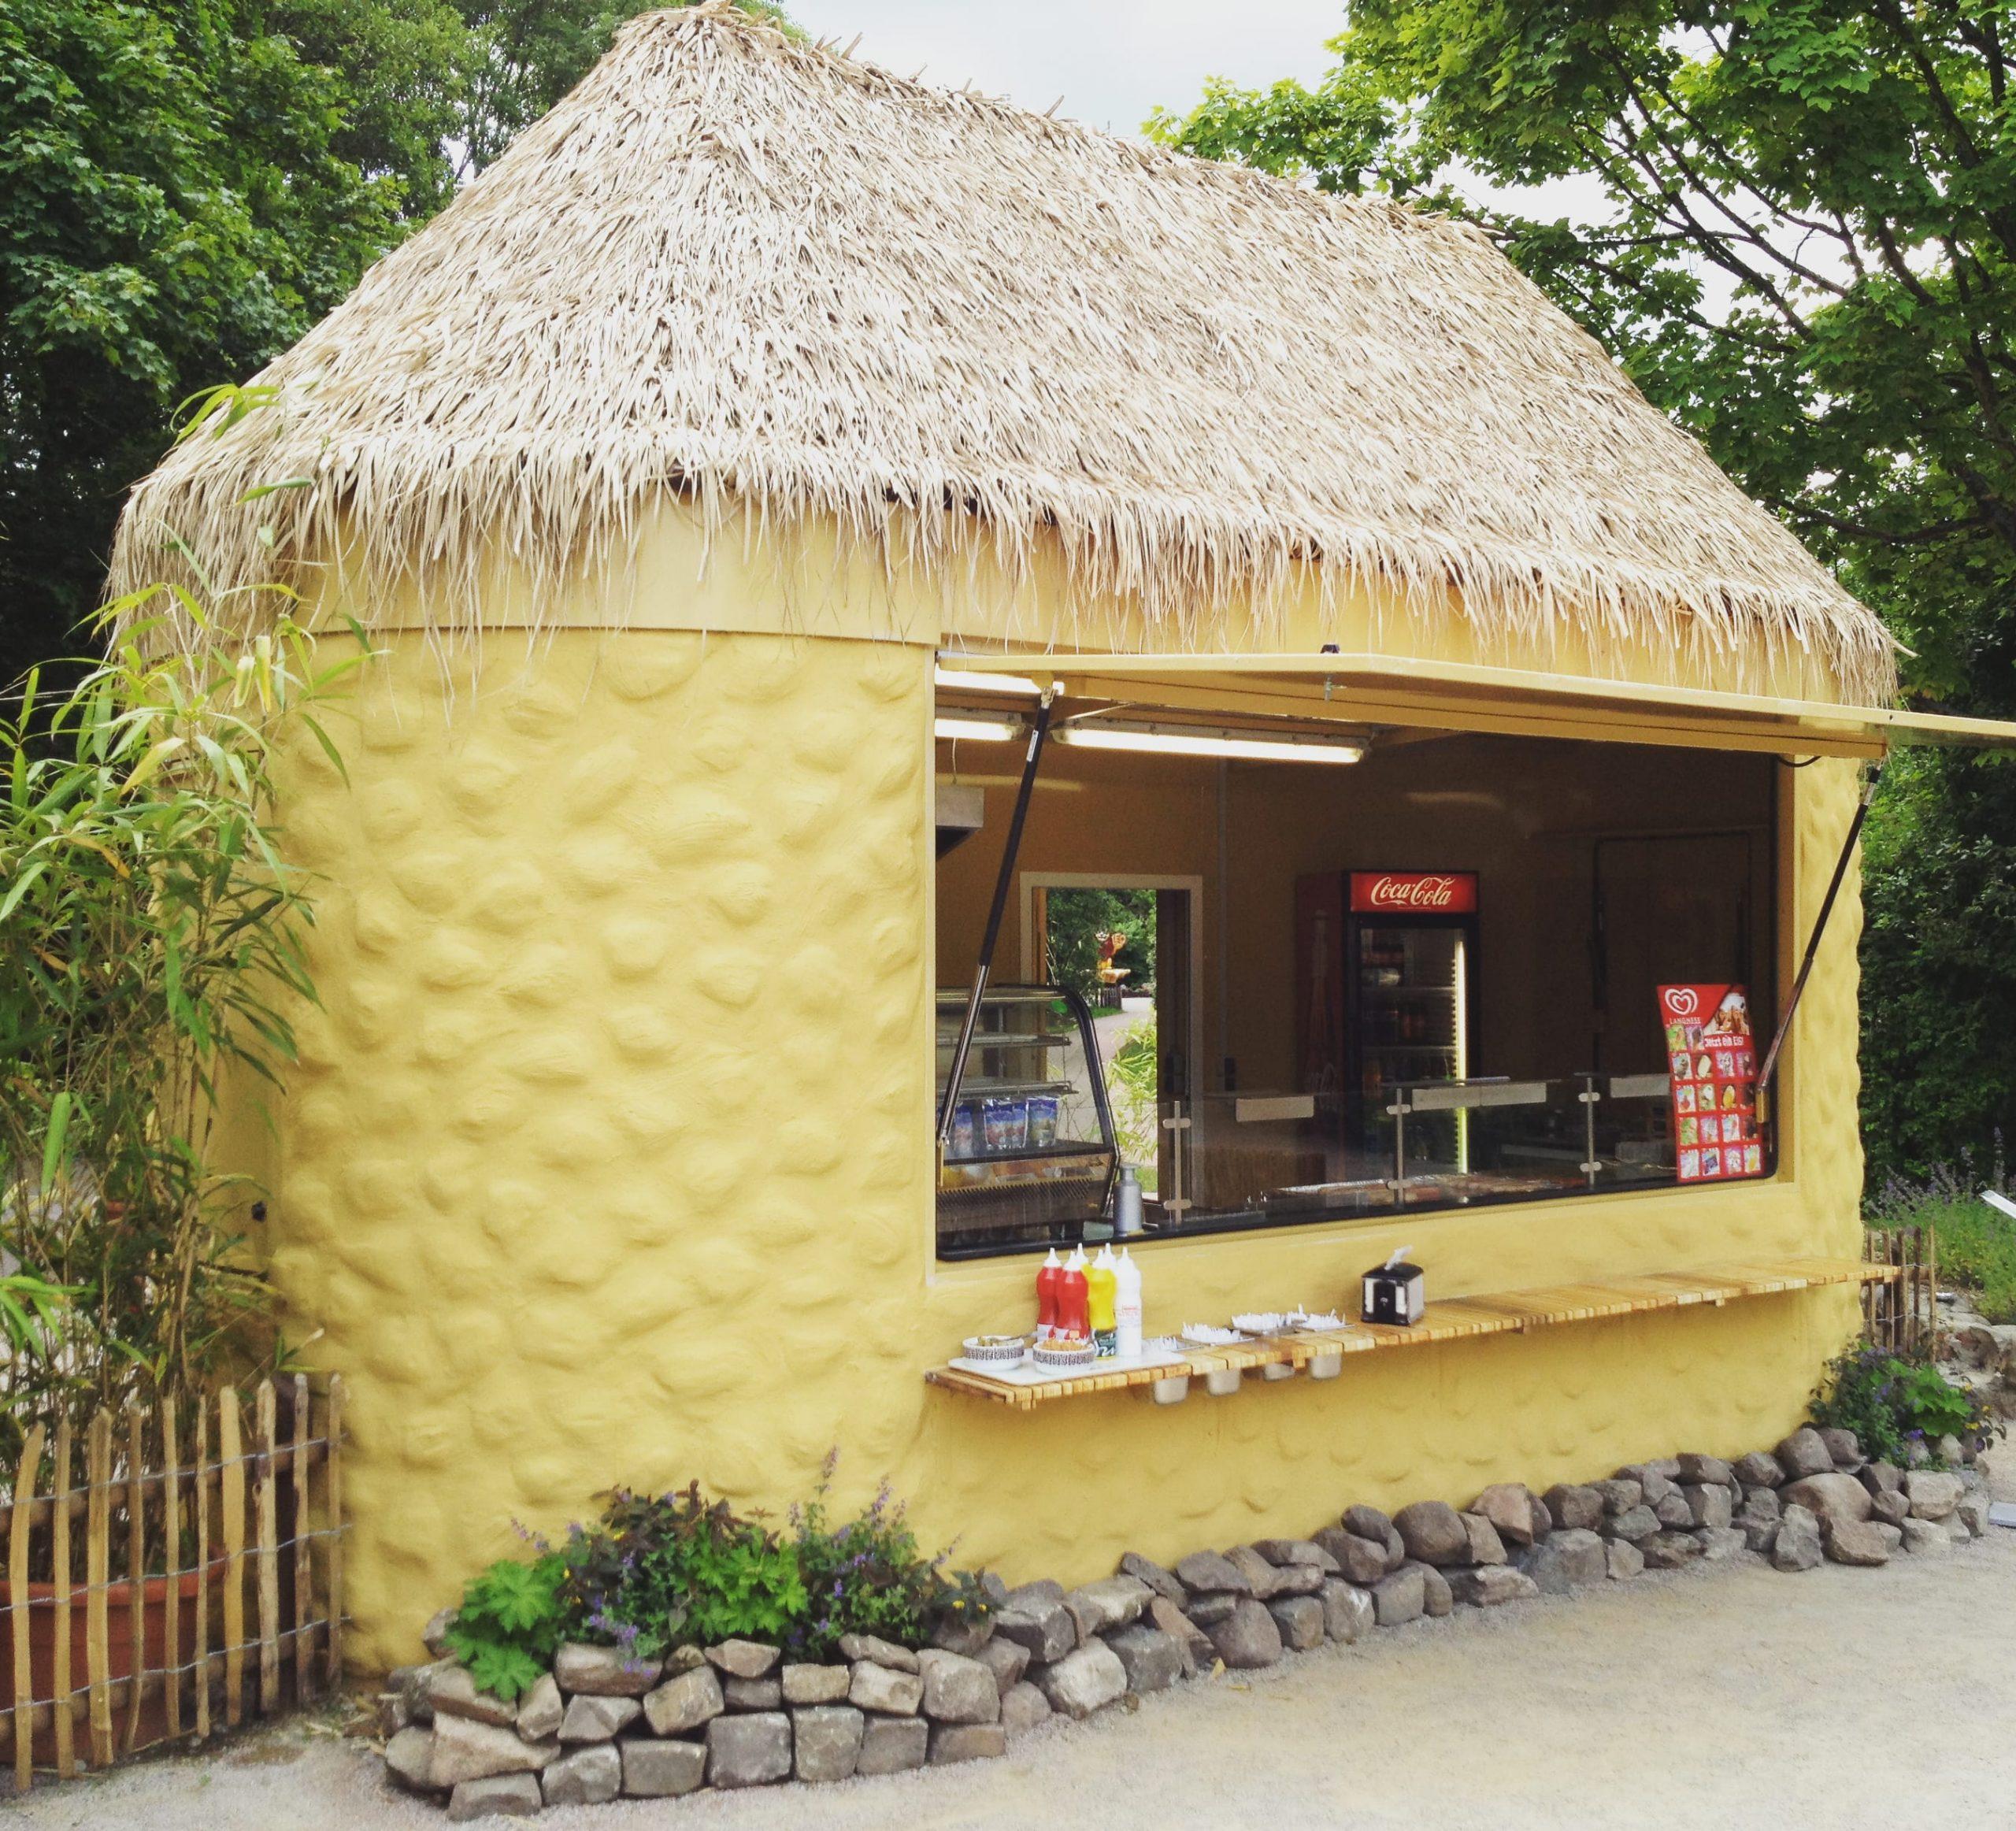 Kiosk Pavillon Imbiss Verkaufsstand Bäcker Brötchen Grill Snack